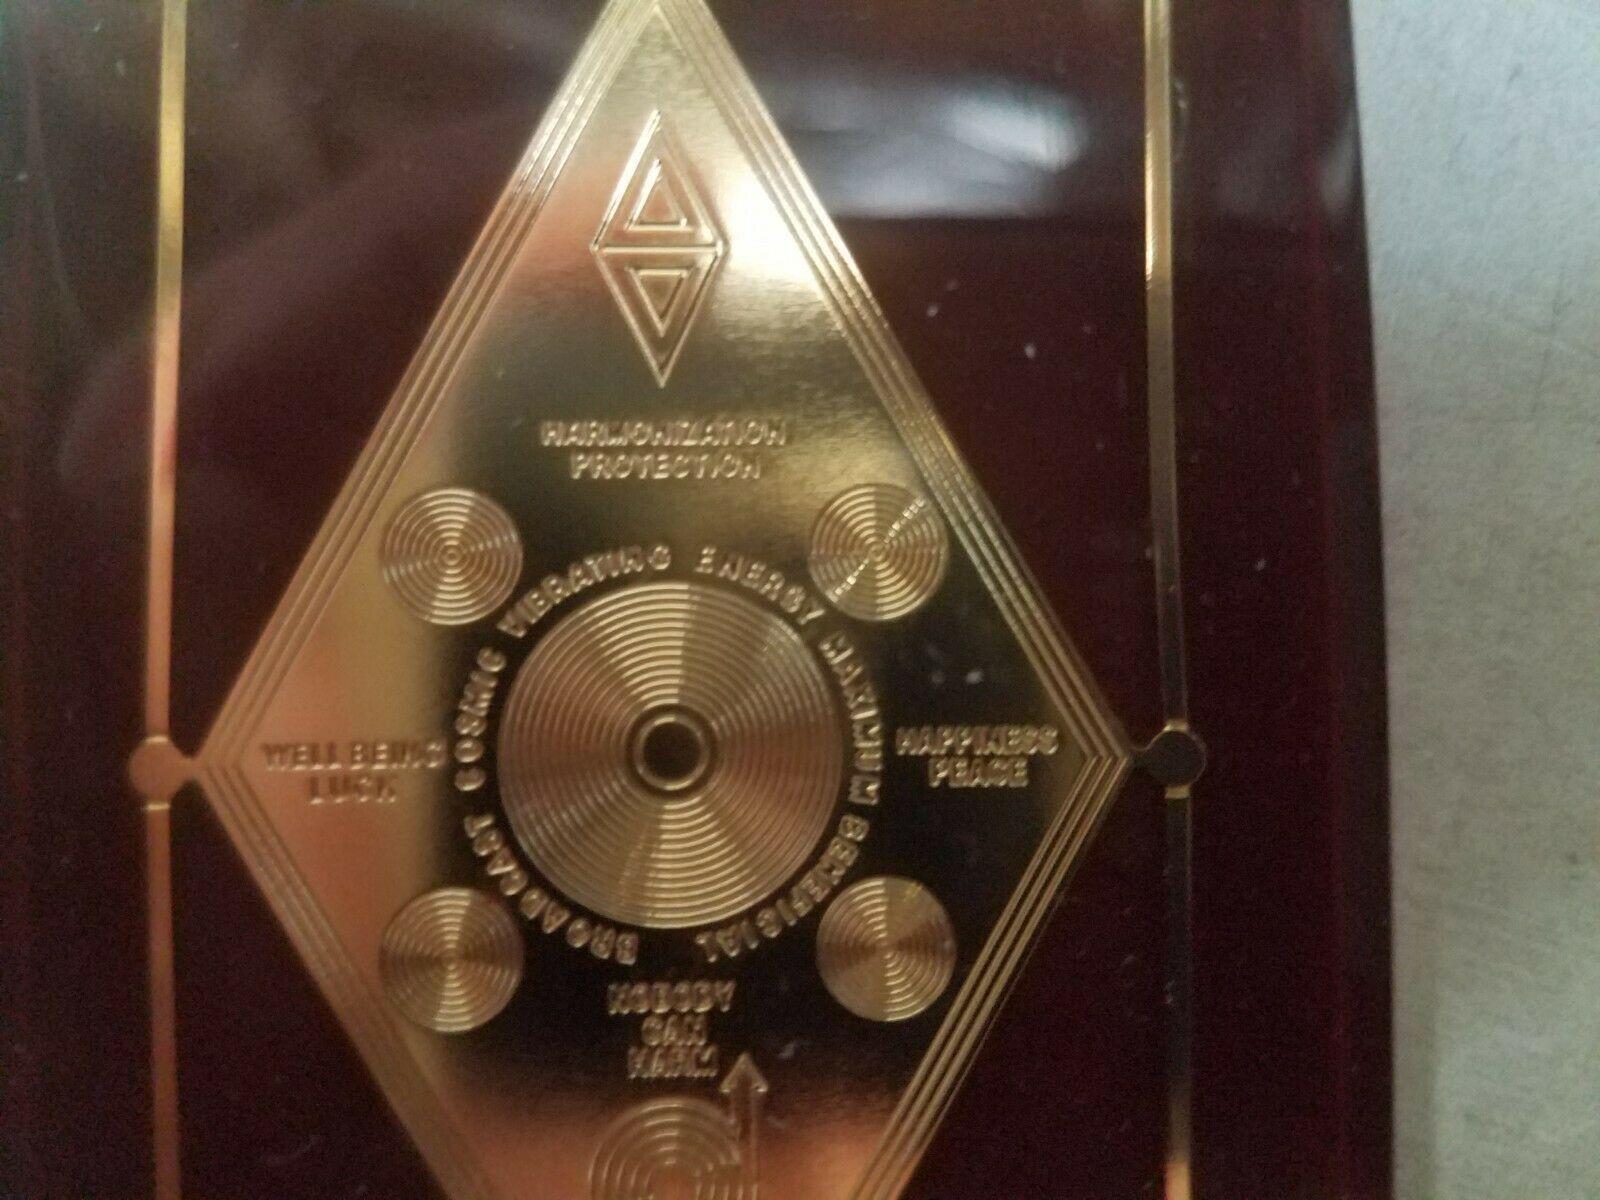 Harmonization Universal Protector Talisman in Lucite Charm Healing Reiki image 3